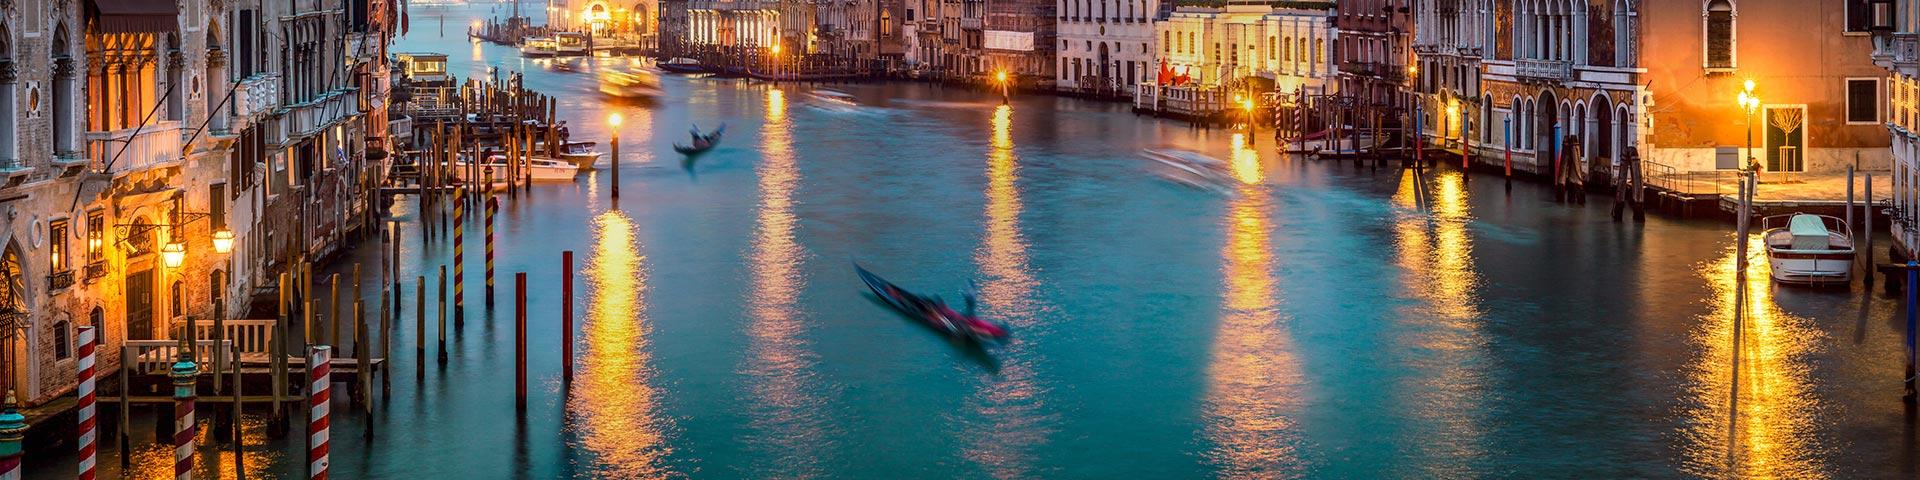 Venice hero